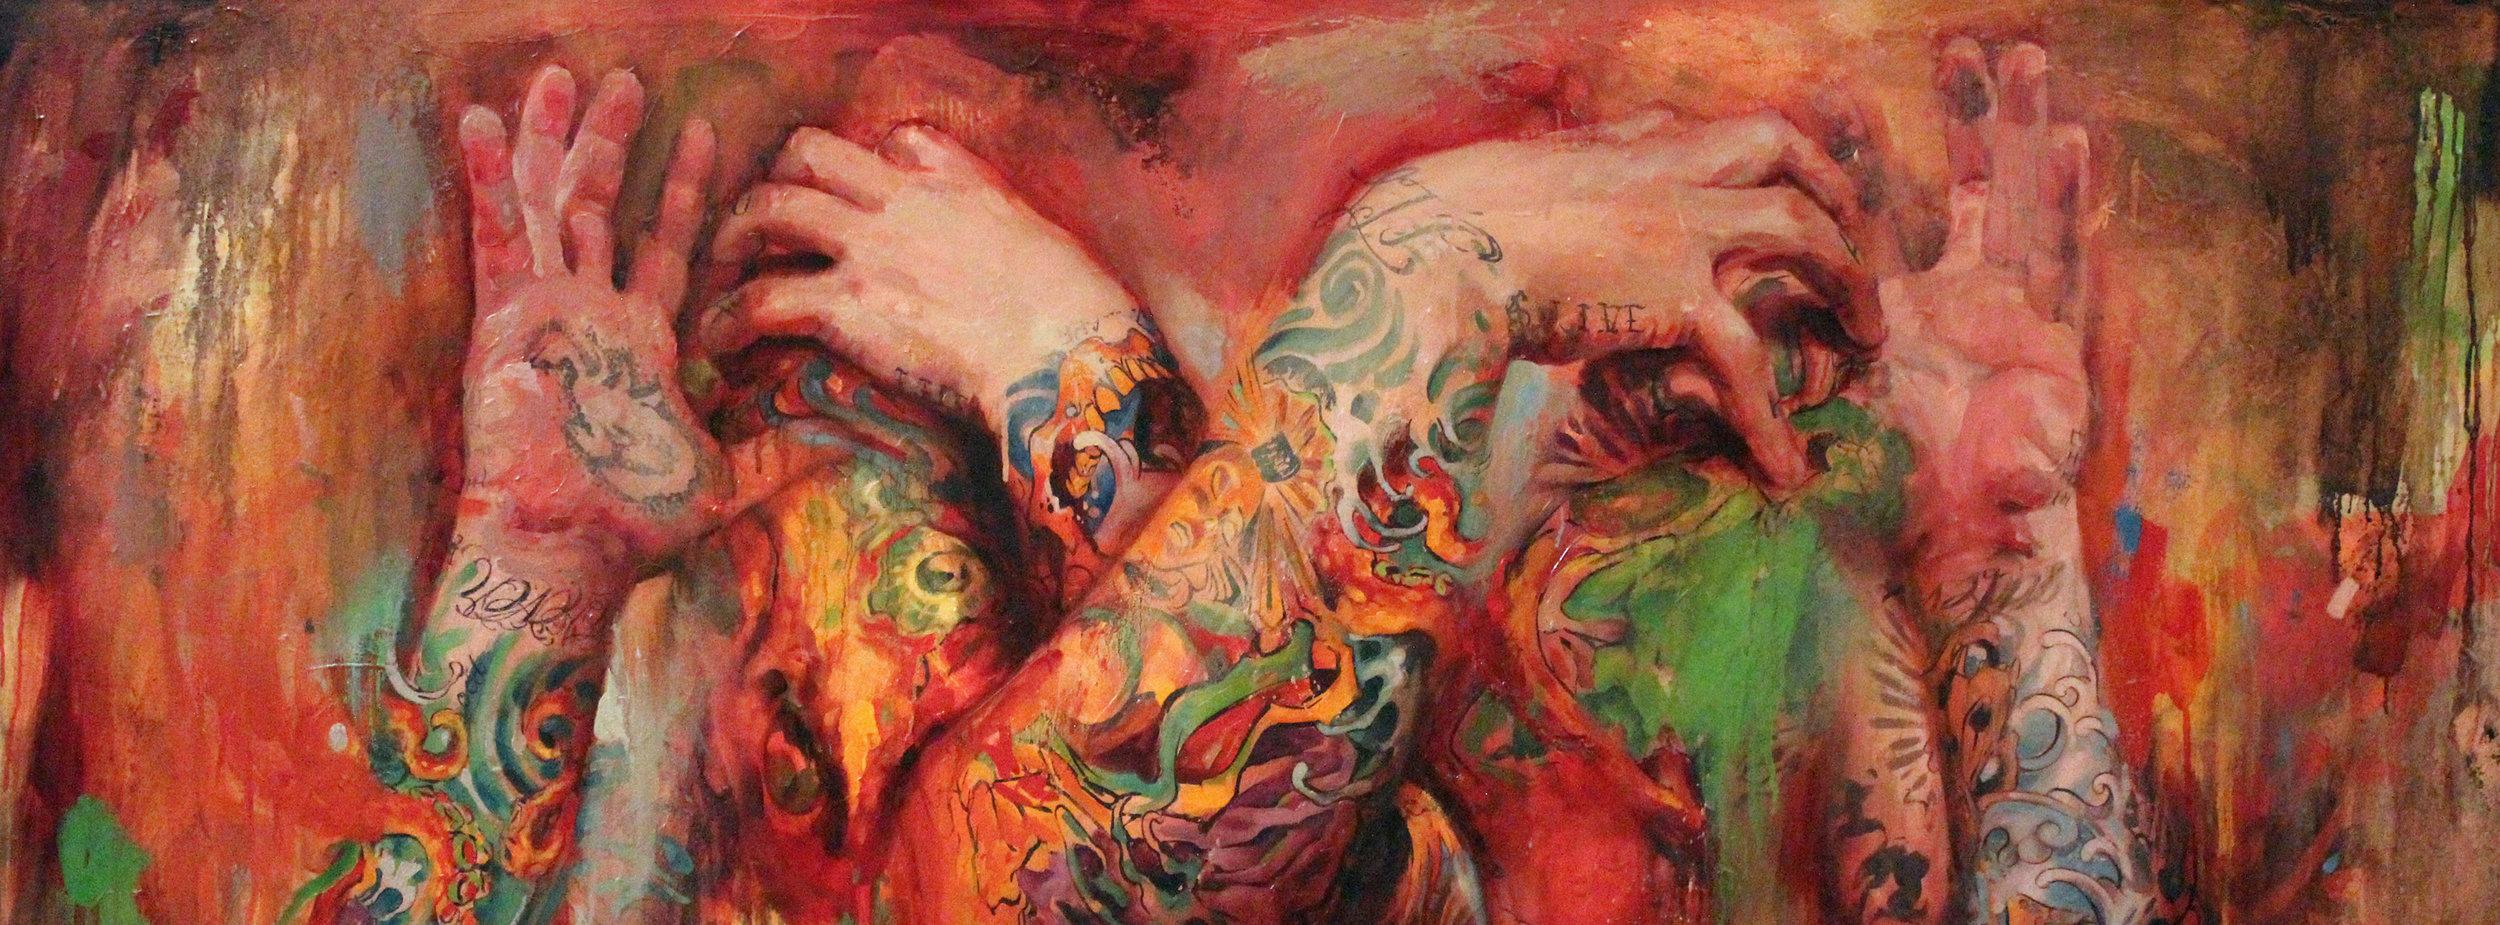 The Tattooed Portraits Series: 12 Year Retrospective  Artist: Shawn Barber